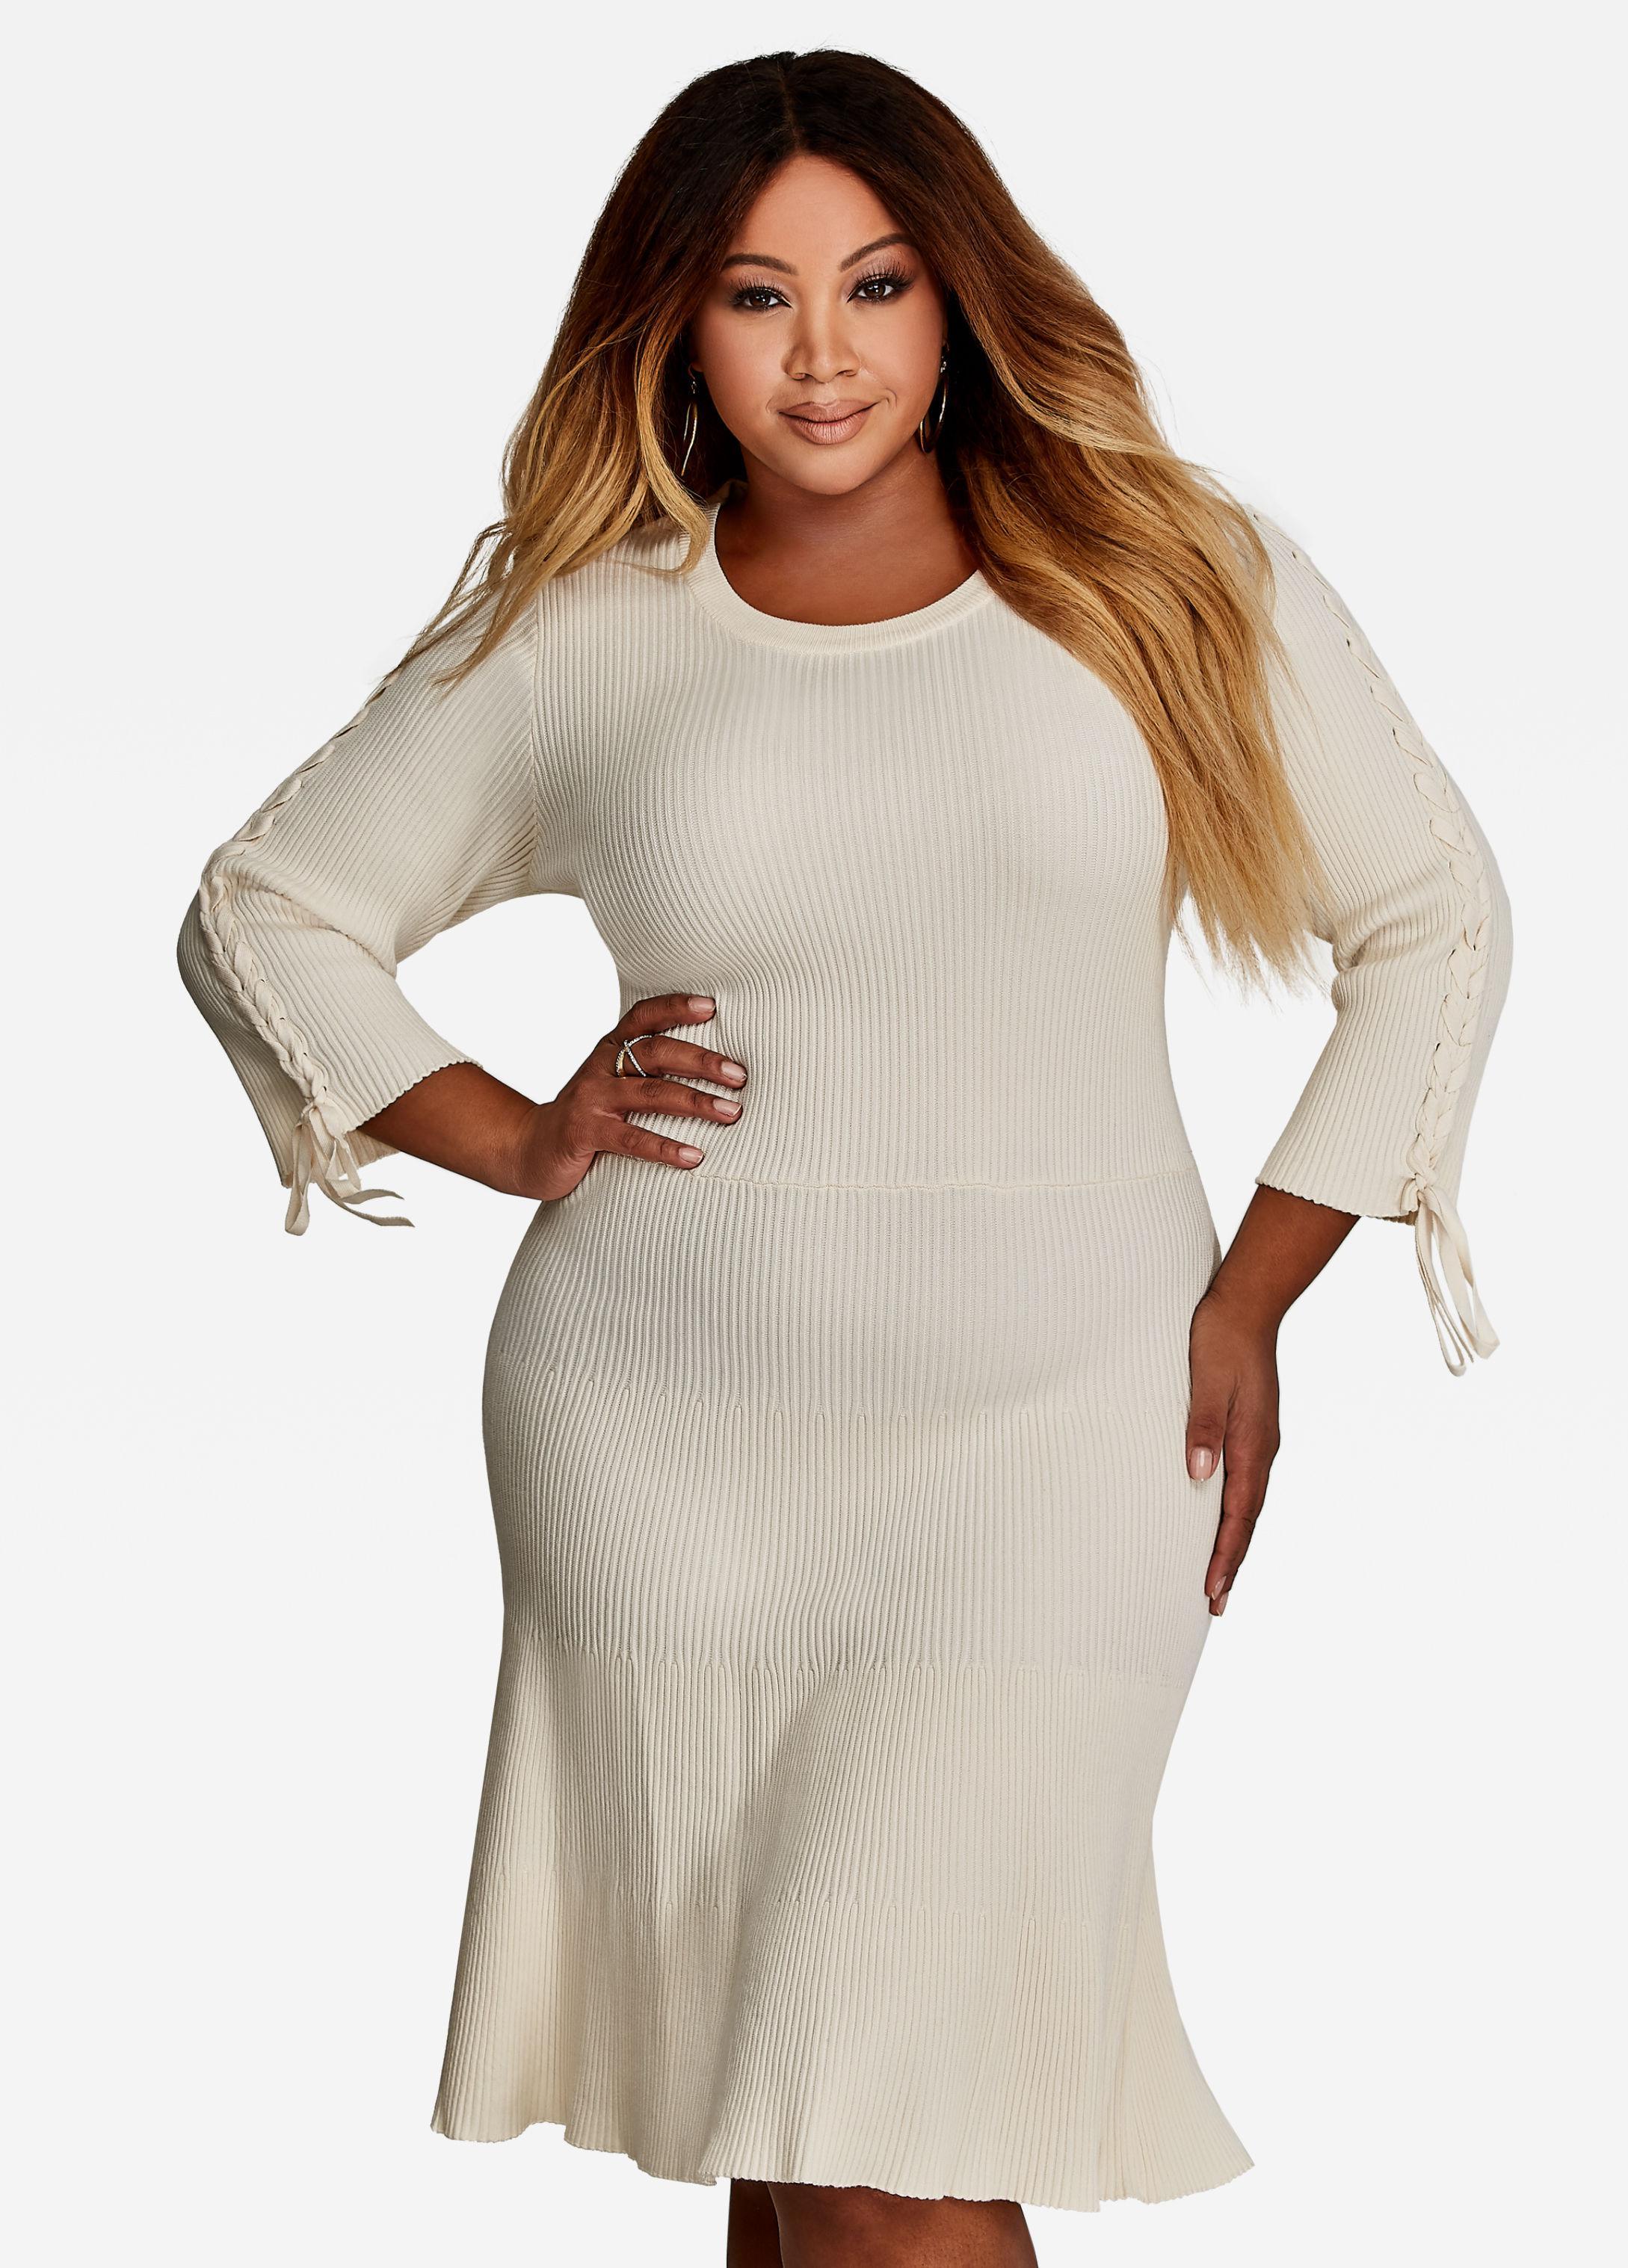 2d25f394dce Lyst - Ashley Stewart Plus Size Lace Up Sweater Dress